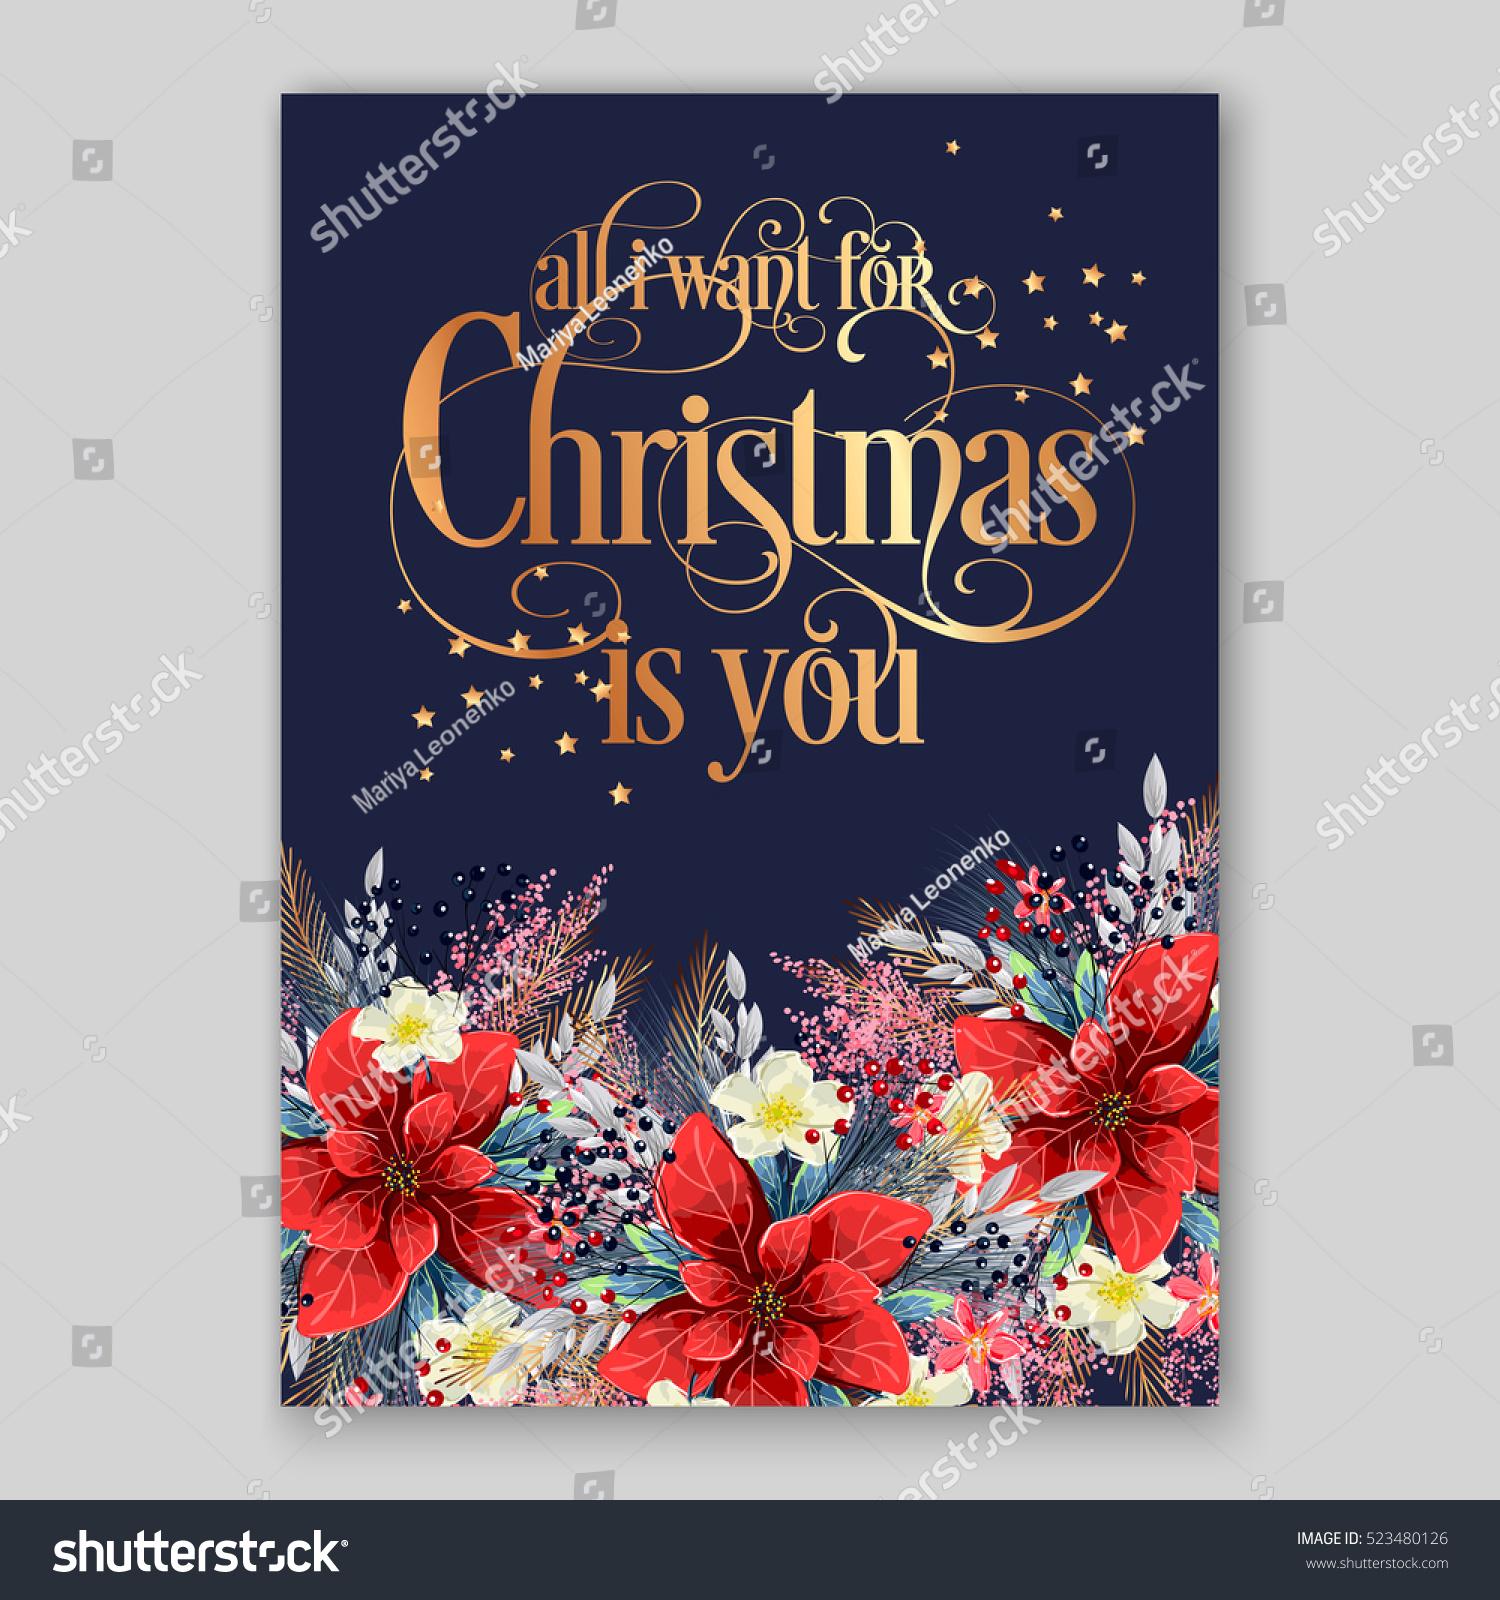 Poinsettia Christmas Party Invitation Sample Card Stock Vector ...